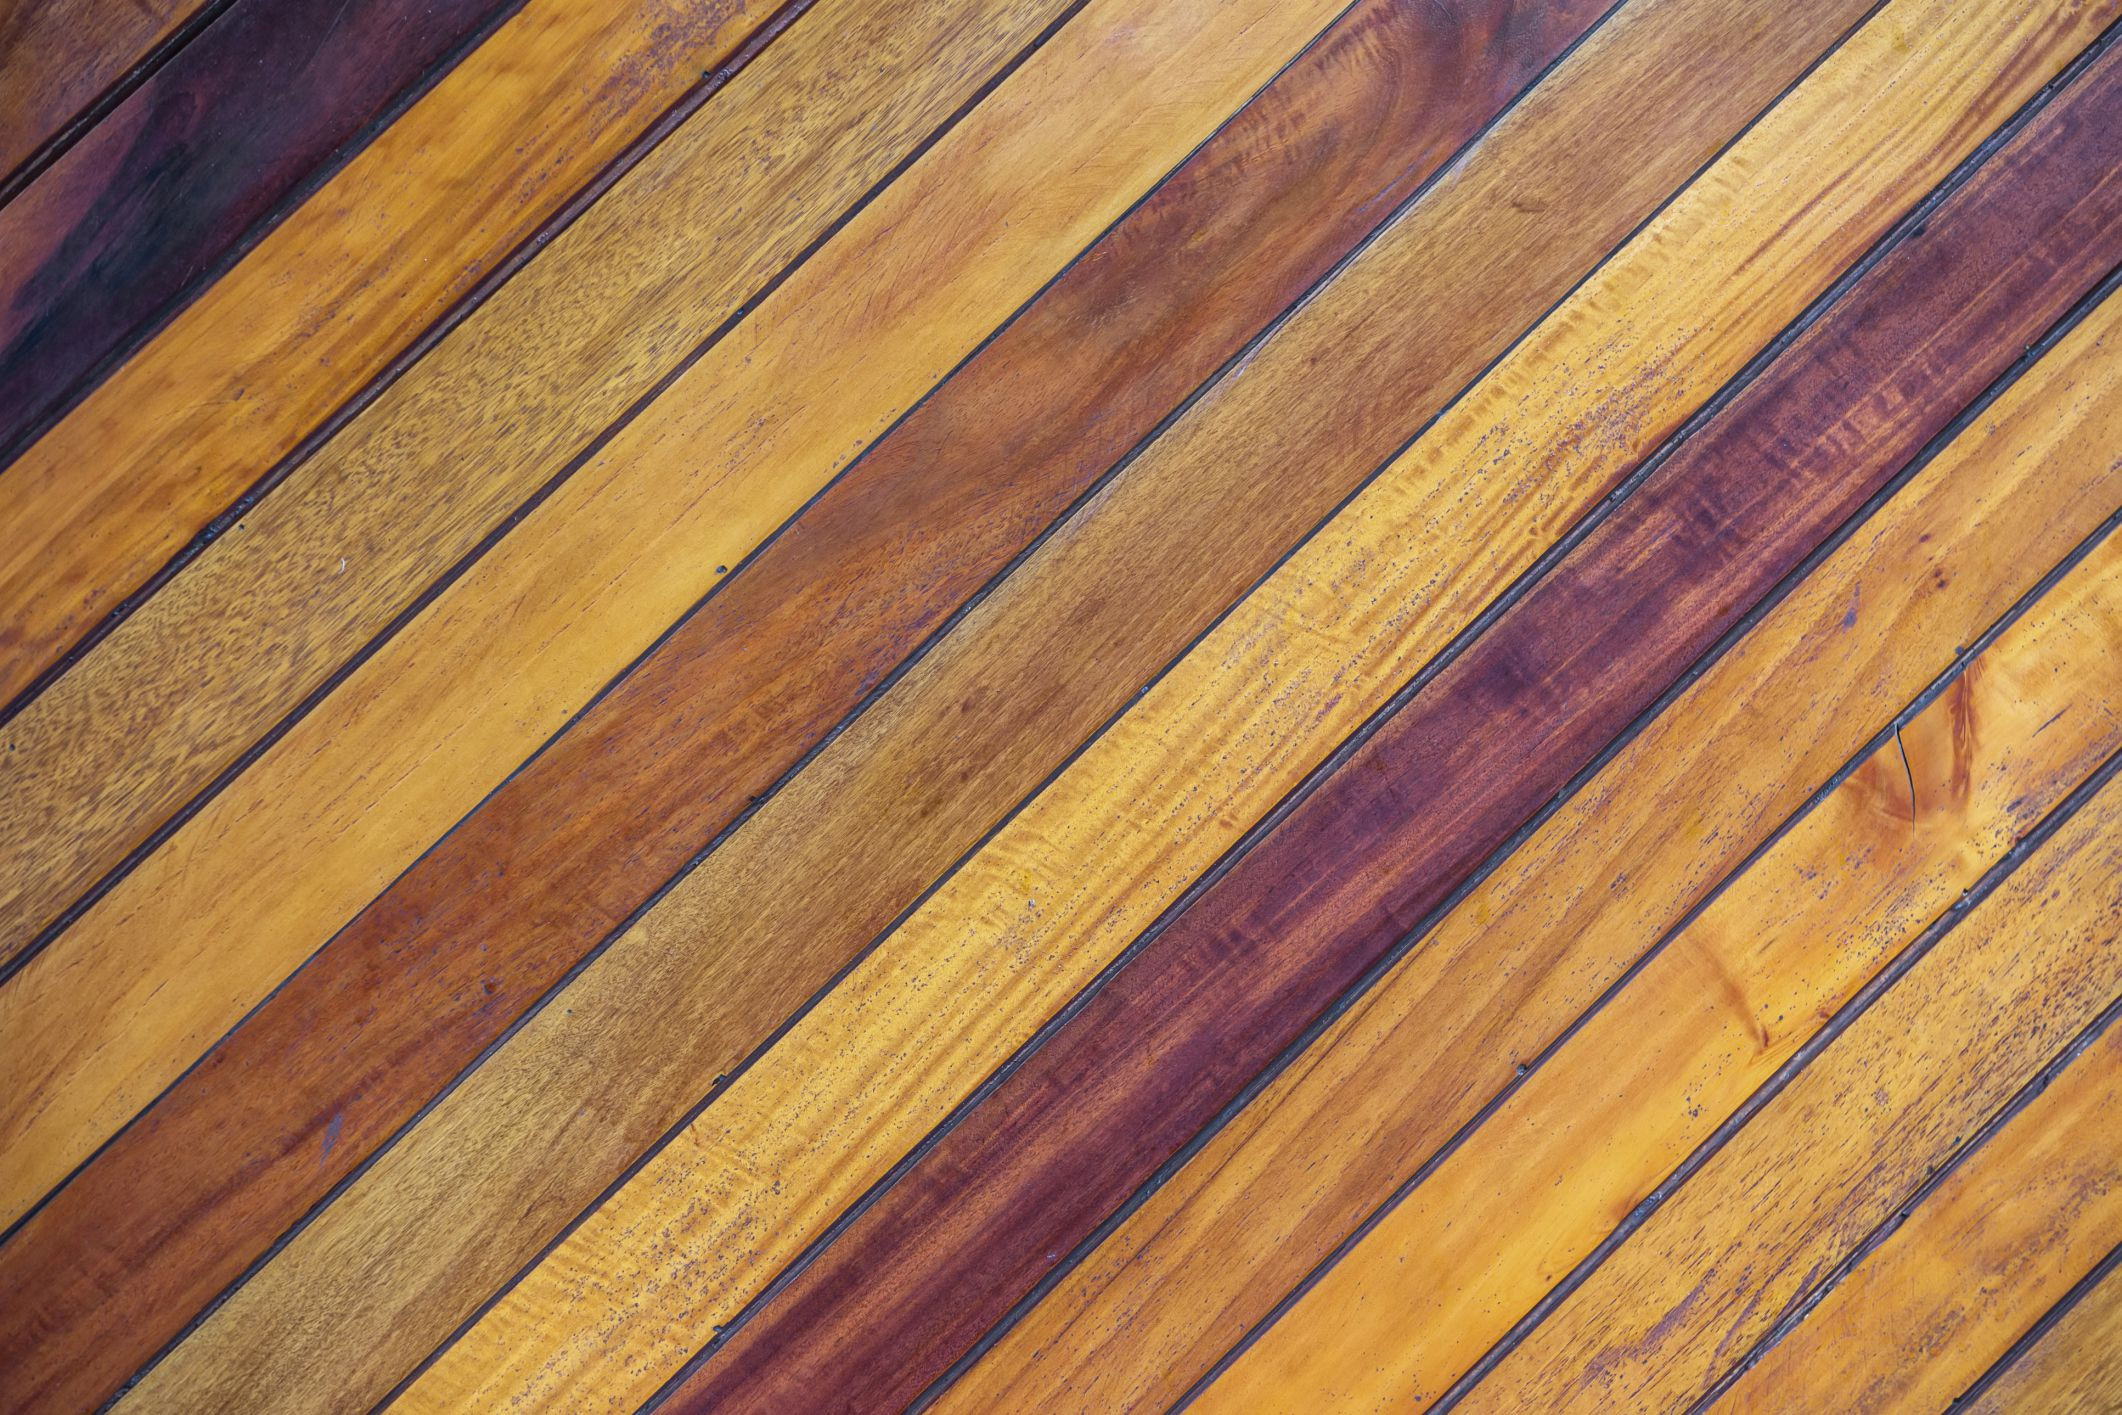 hardwood floor gouge repair of subfloor repair and floor leveling techniques throughout uneven wooden flooring 170024909 56a4a1853df78cf7728353ab